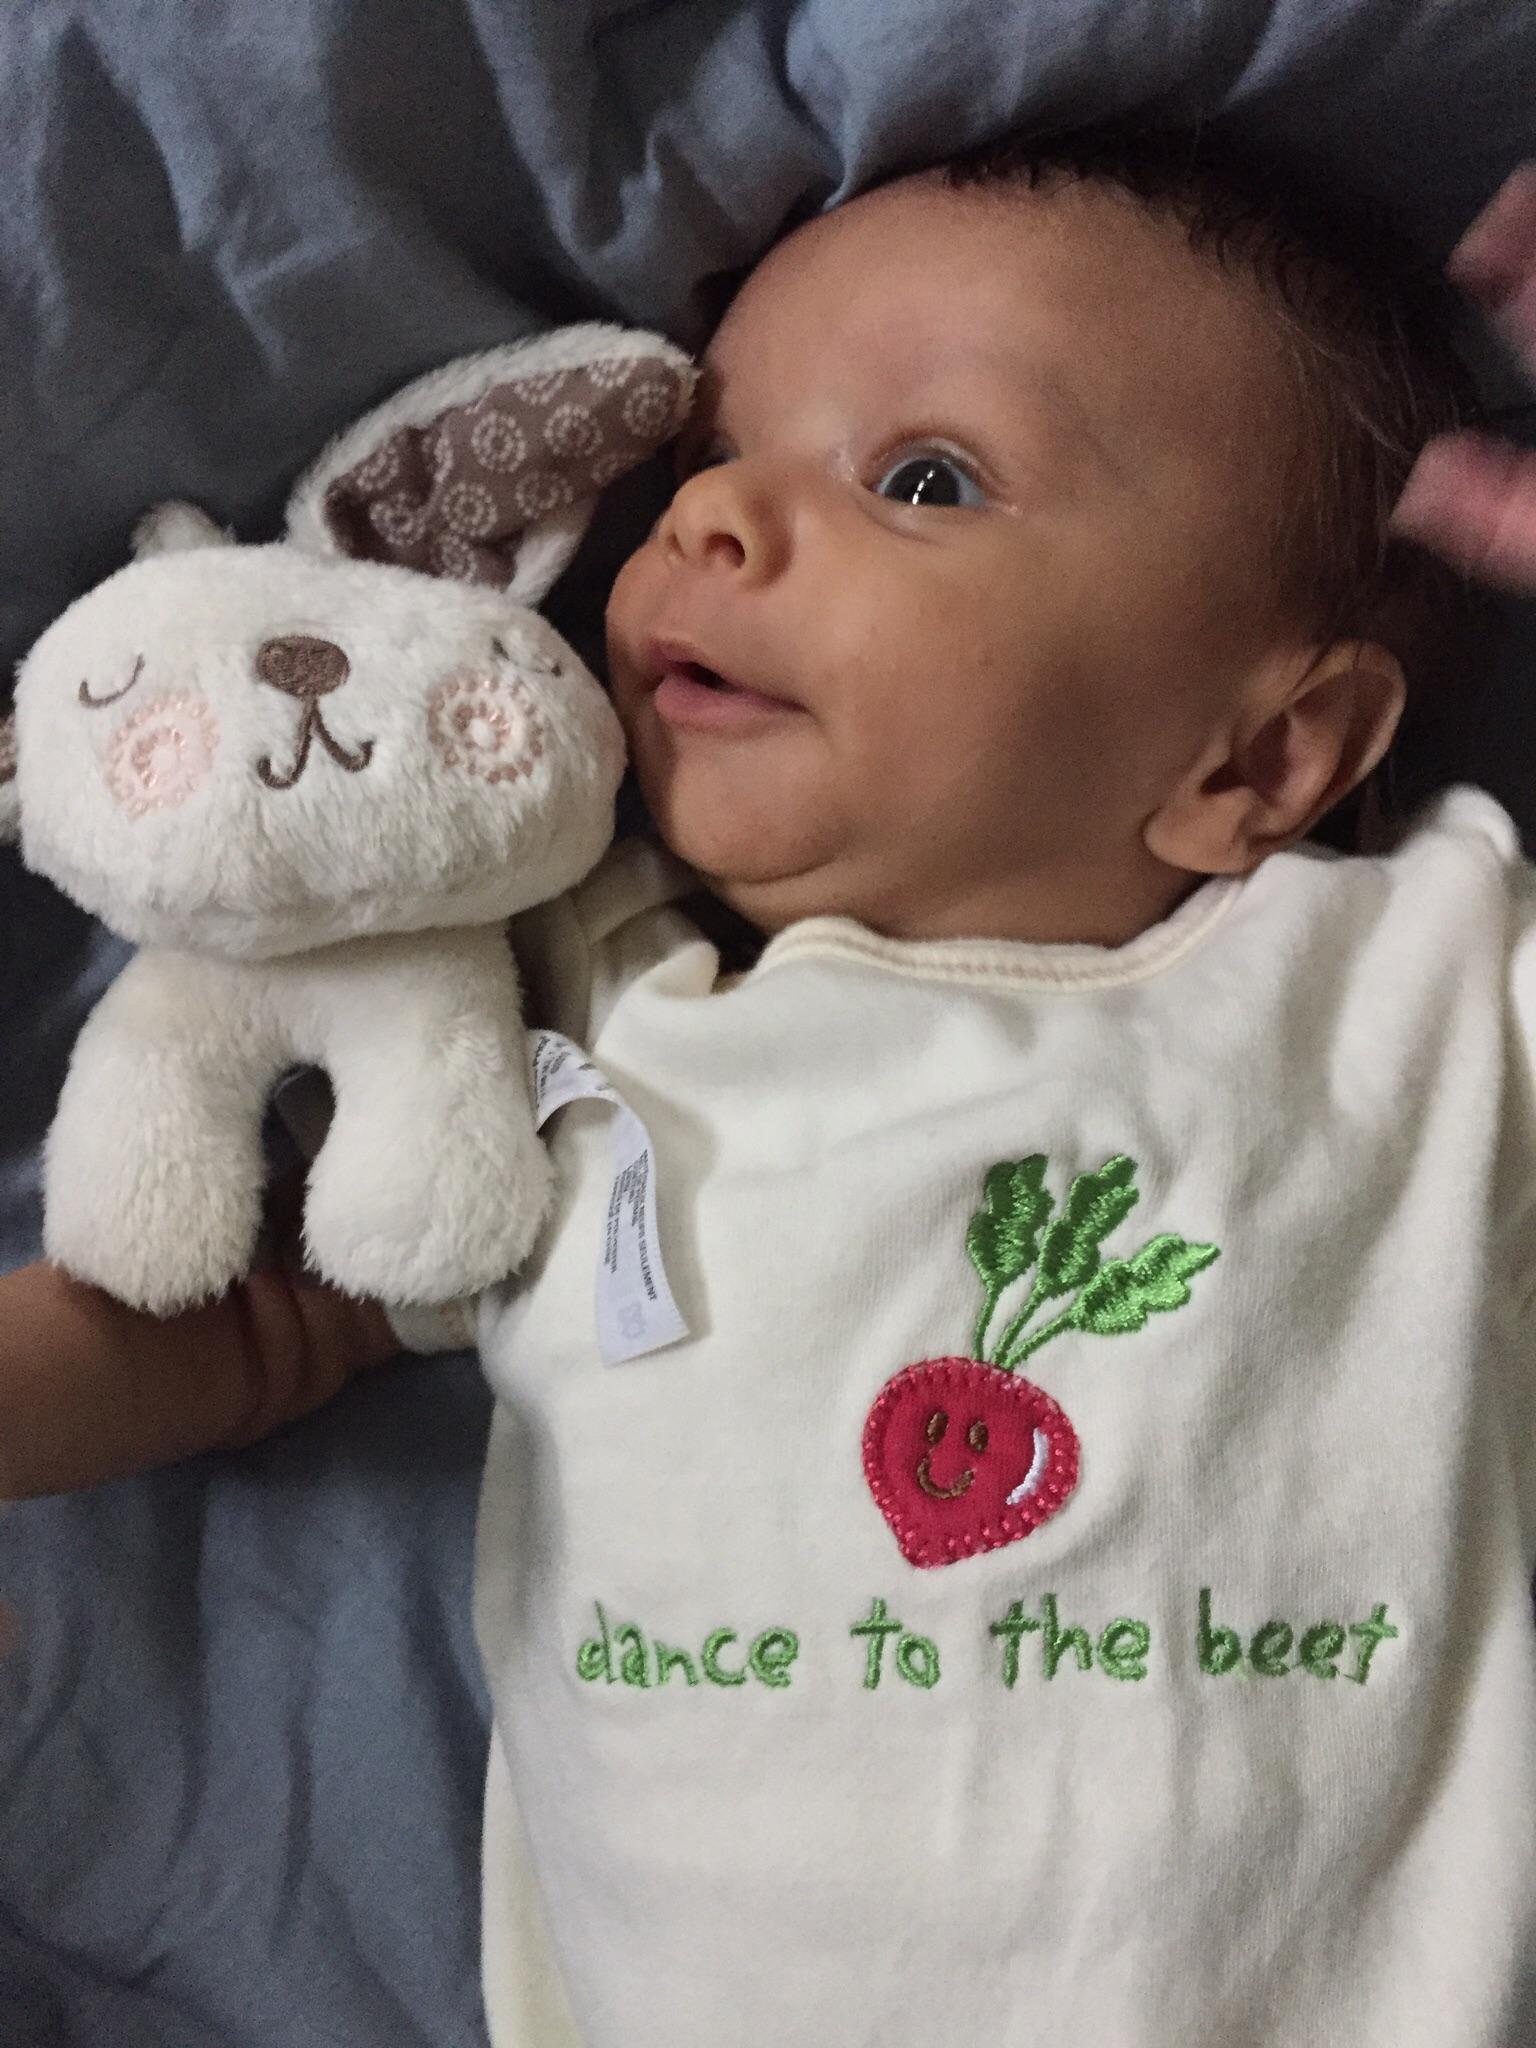 Fullsize Of 5 Week Old Baby